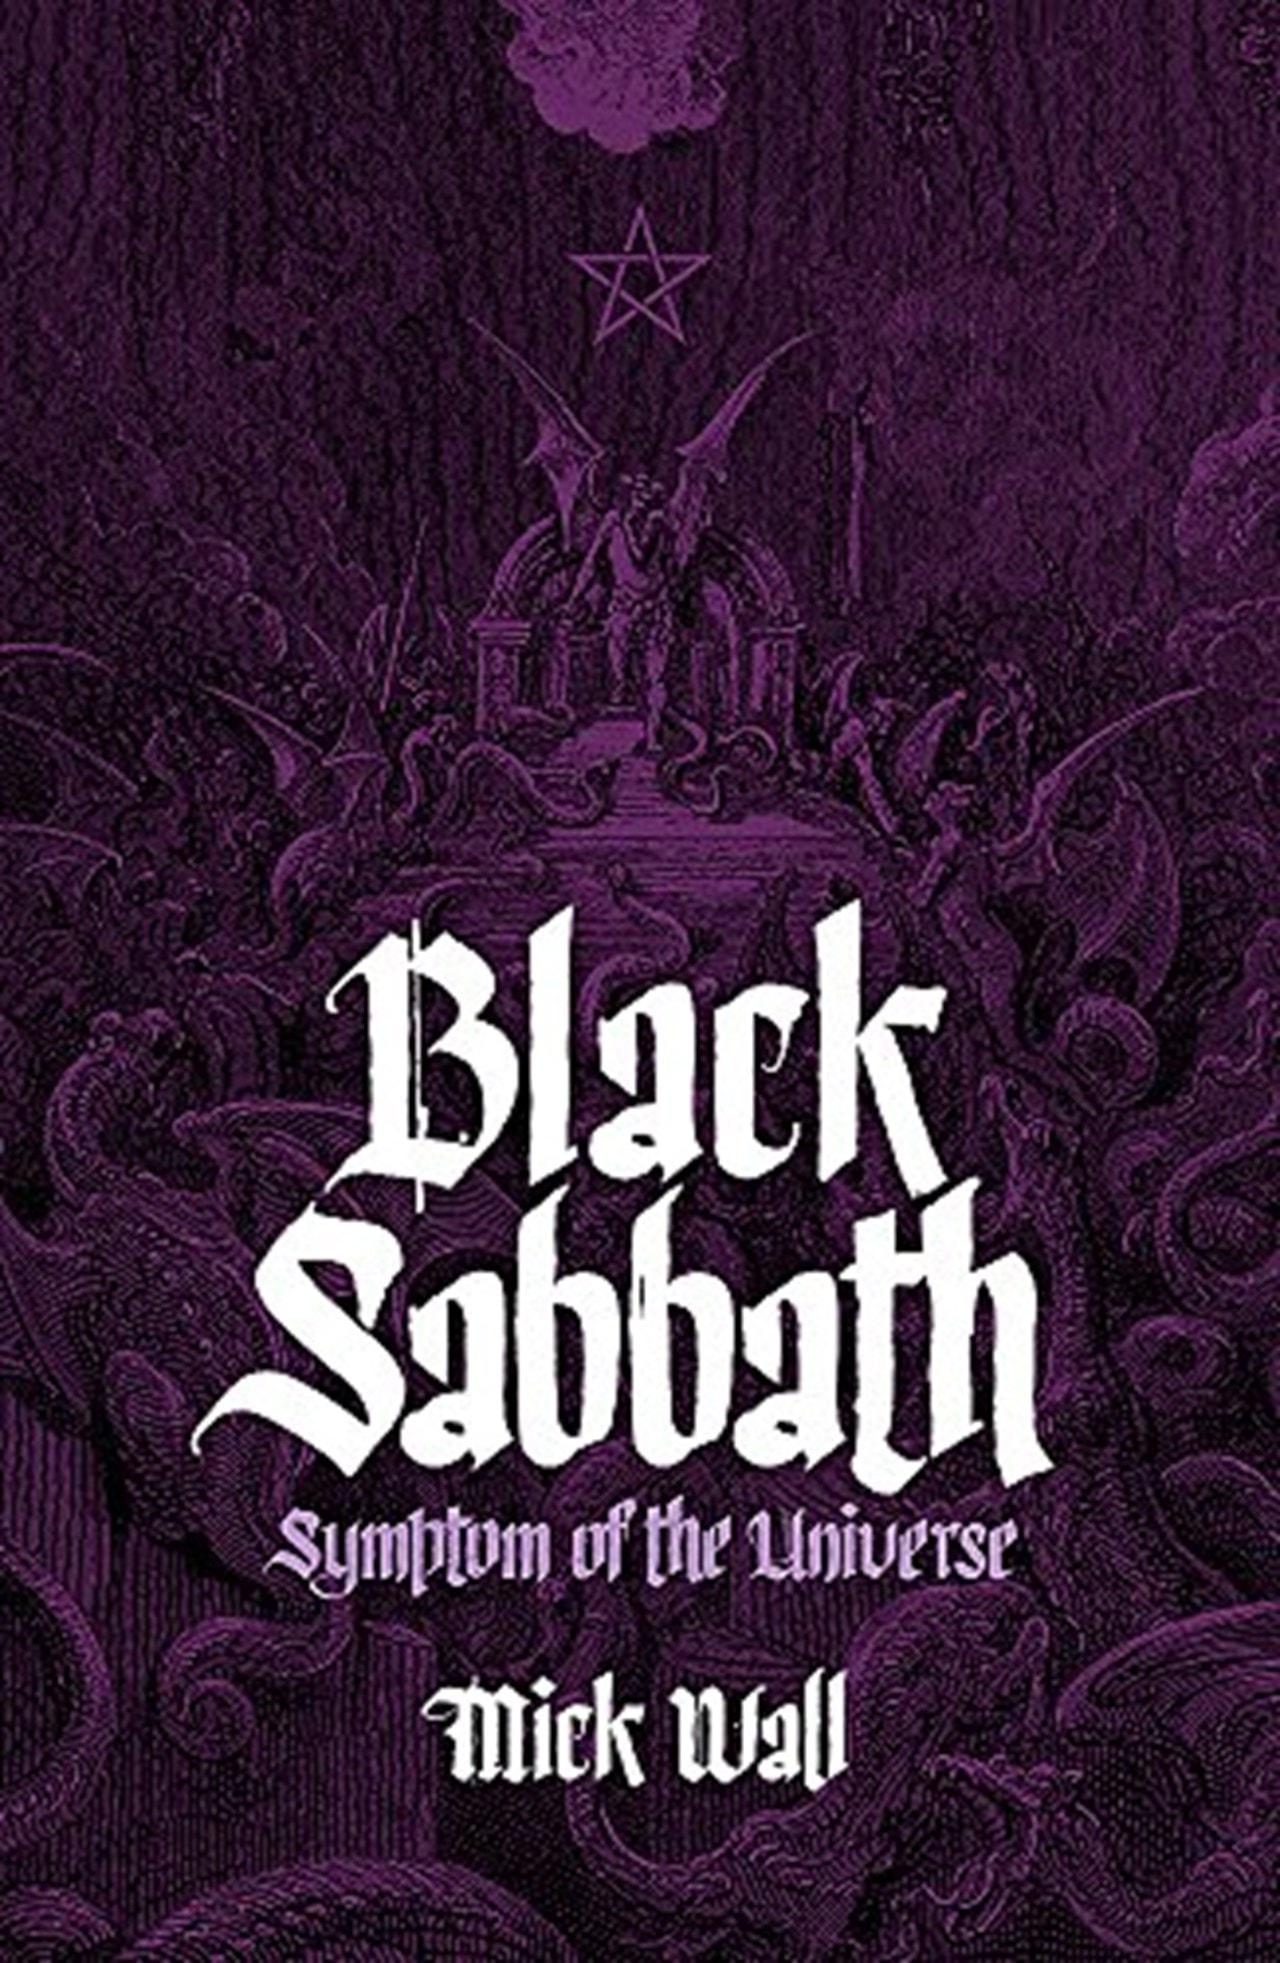 Black Sabbath: Symptom of the Universe - 1